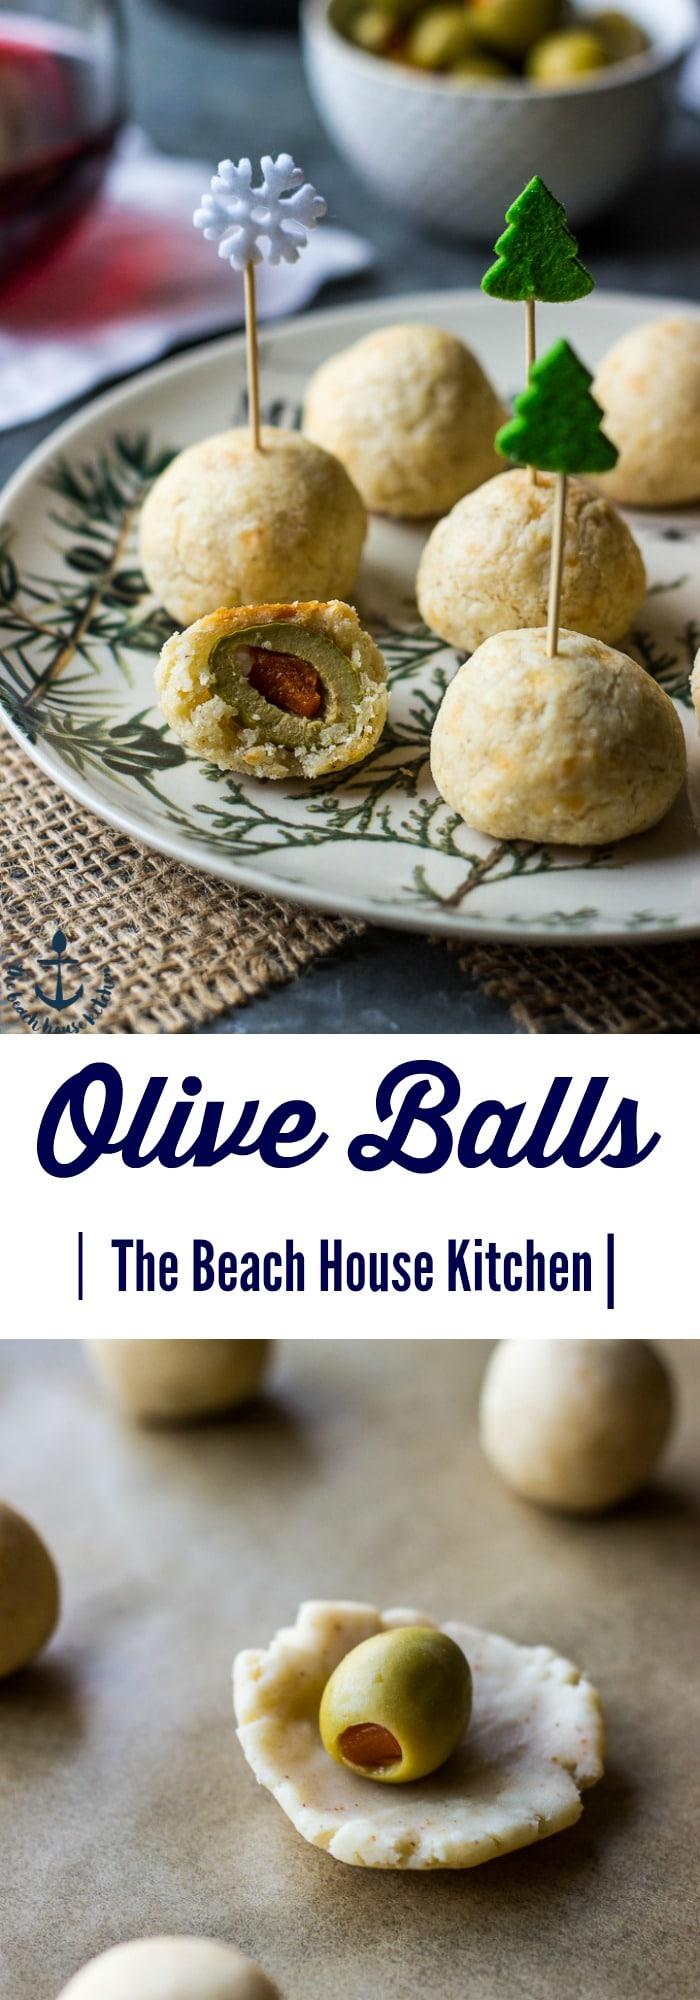 Olive Balls